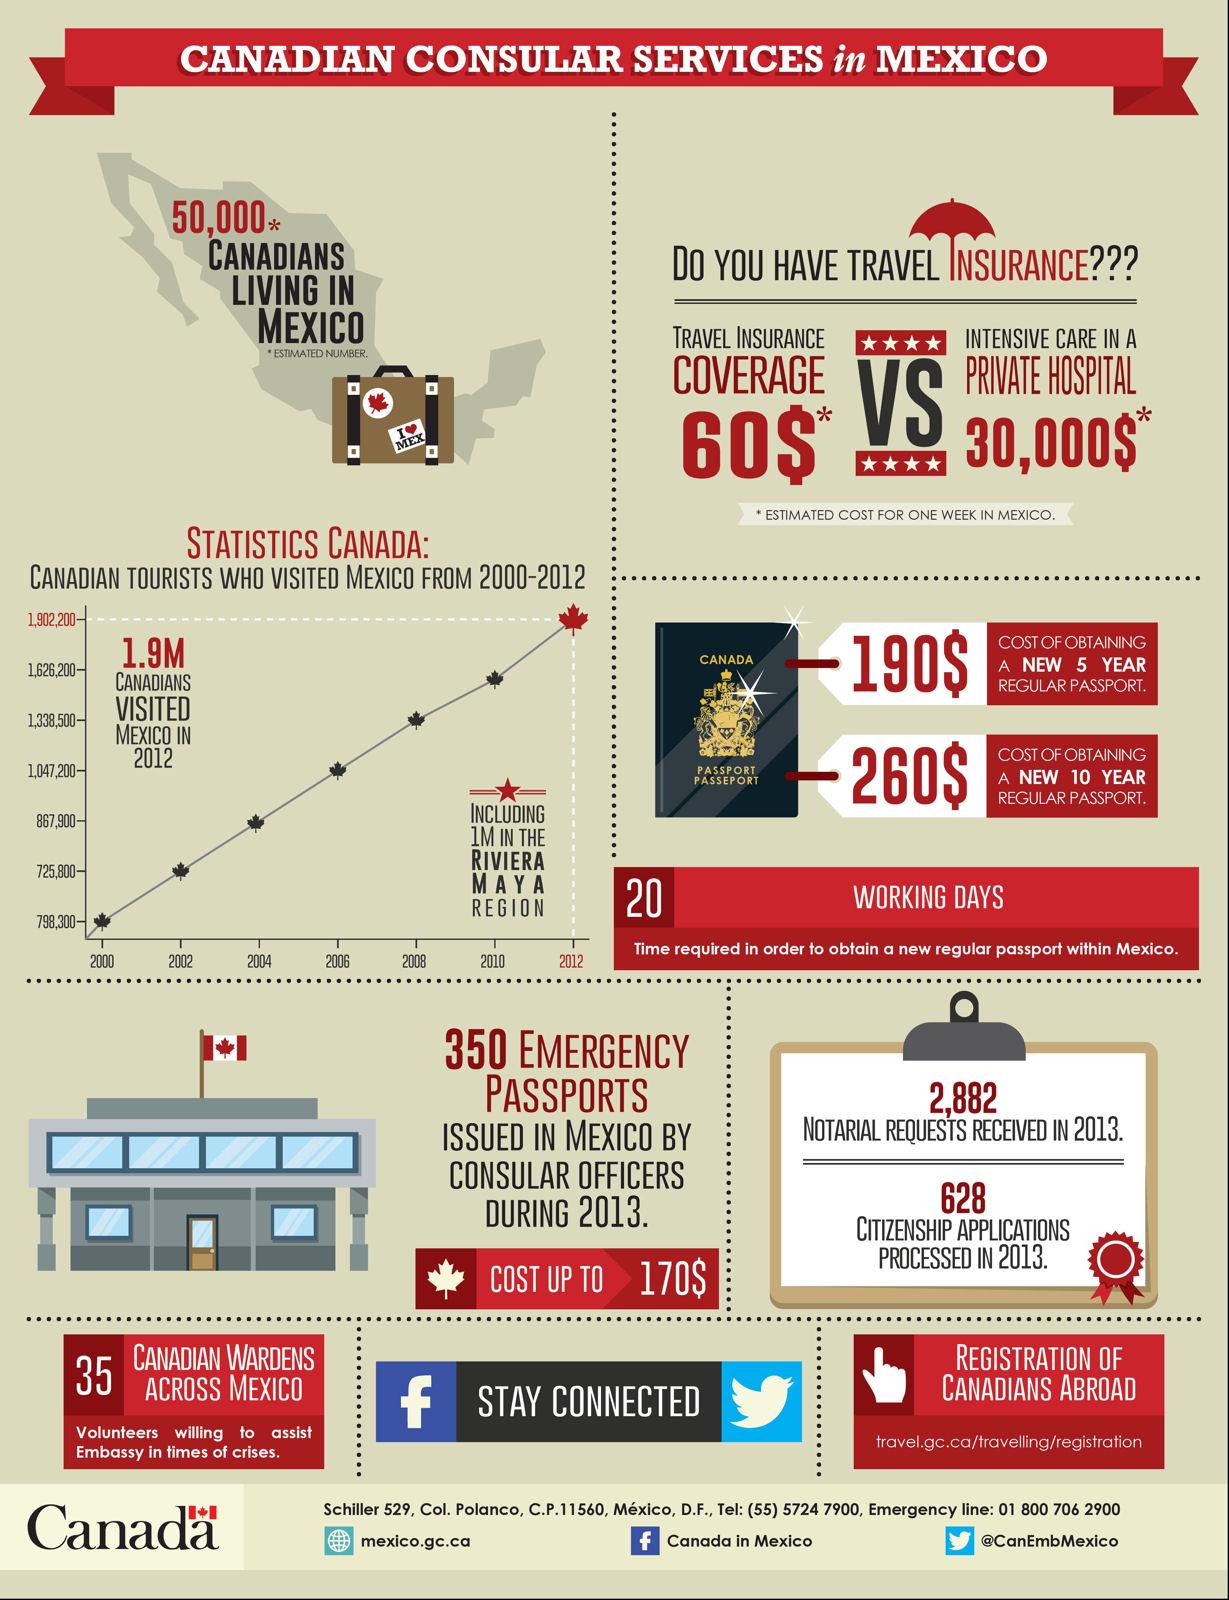 Canadian consular services in mexico for Consular services